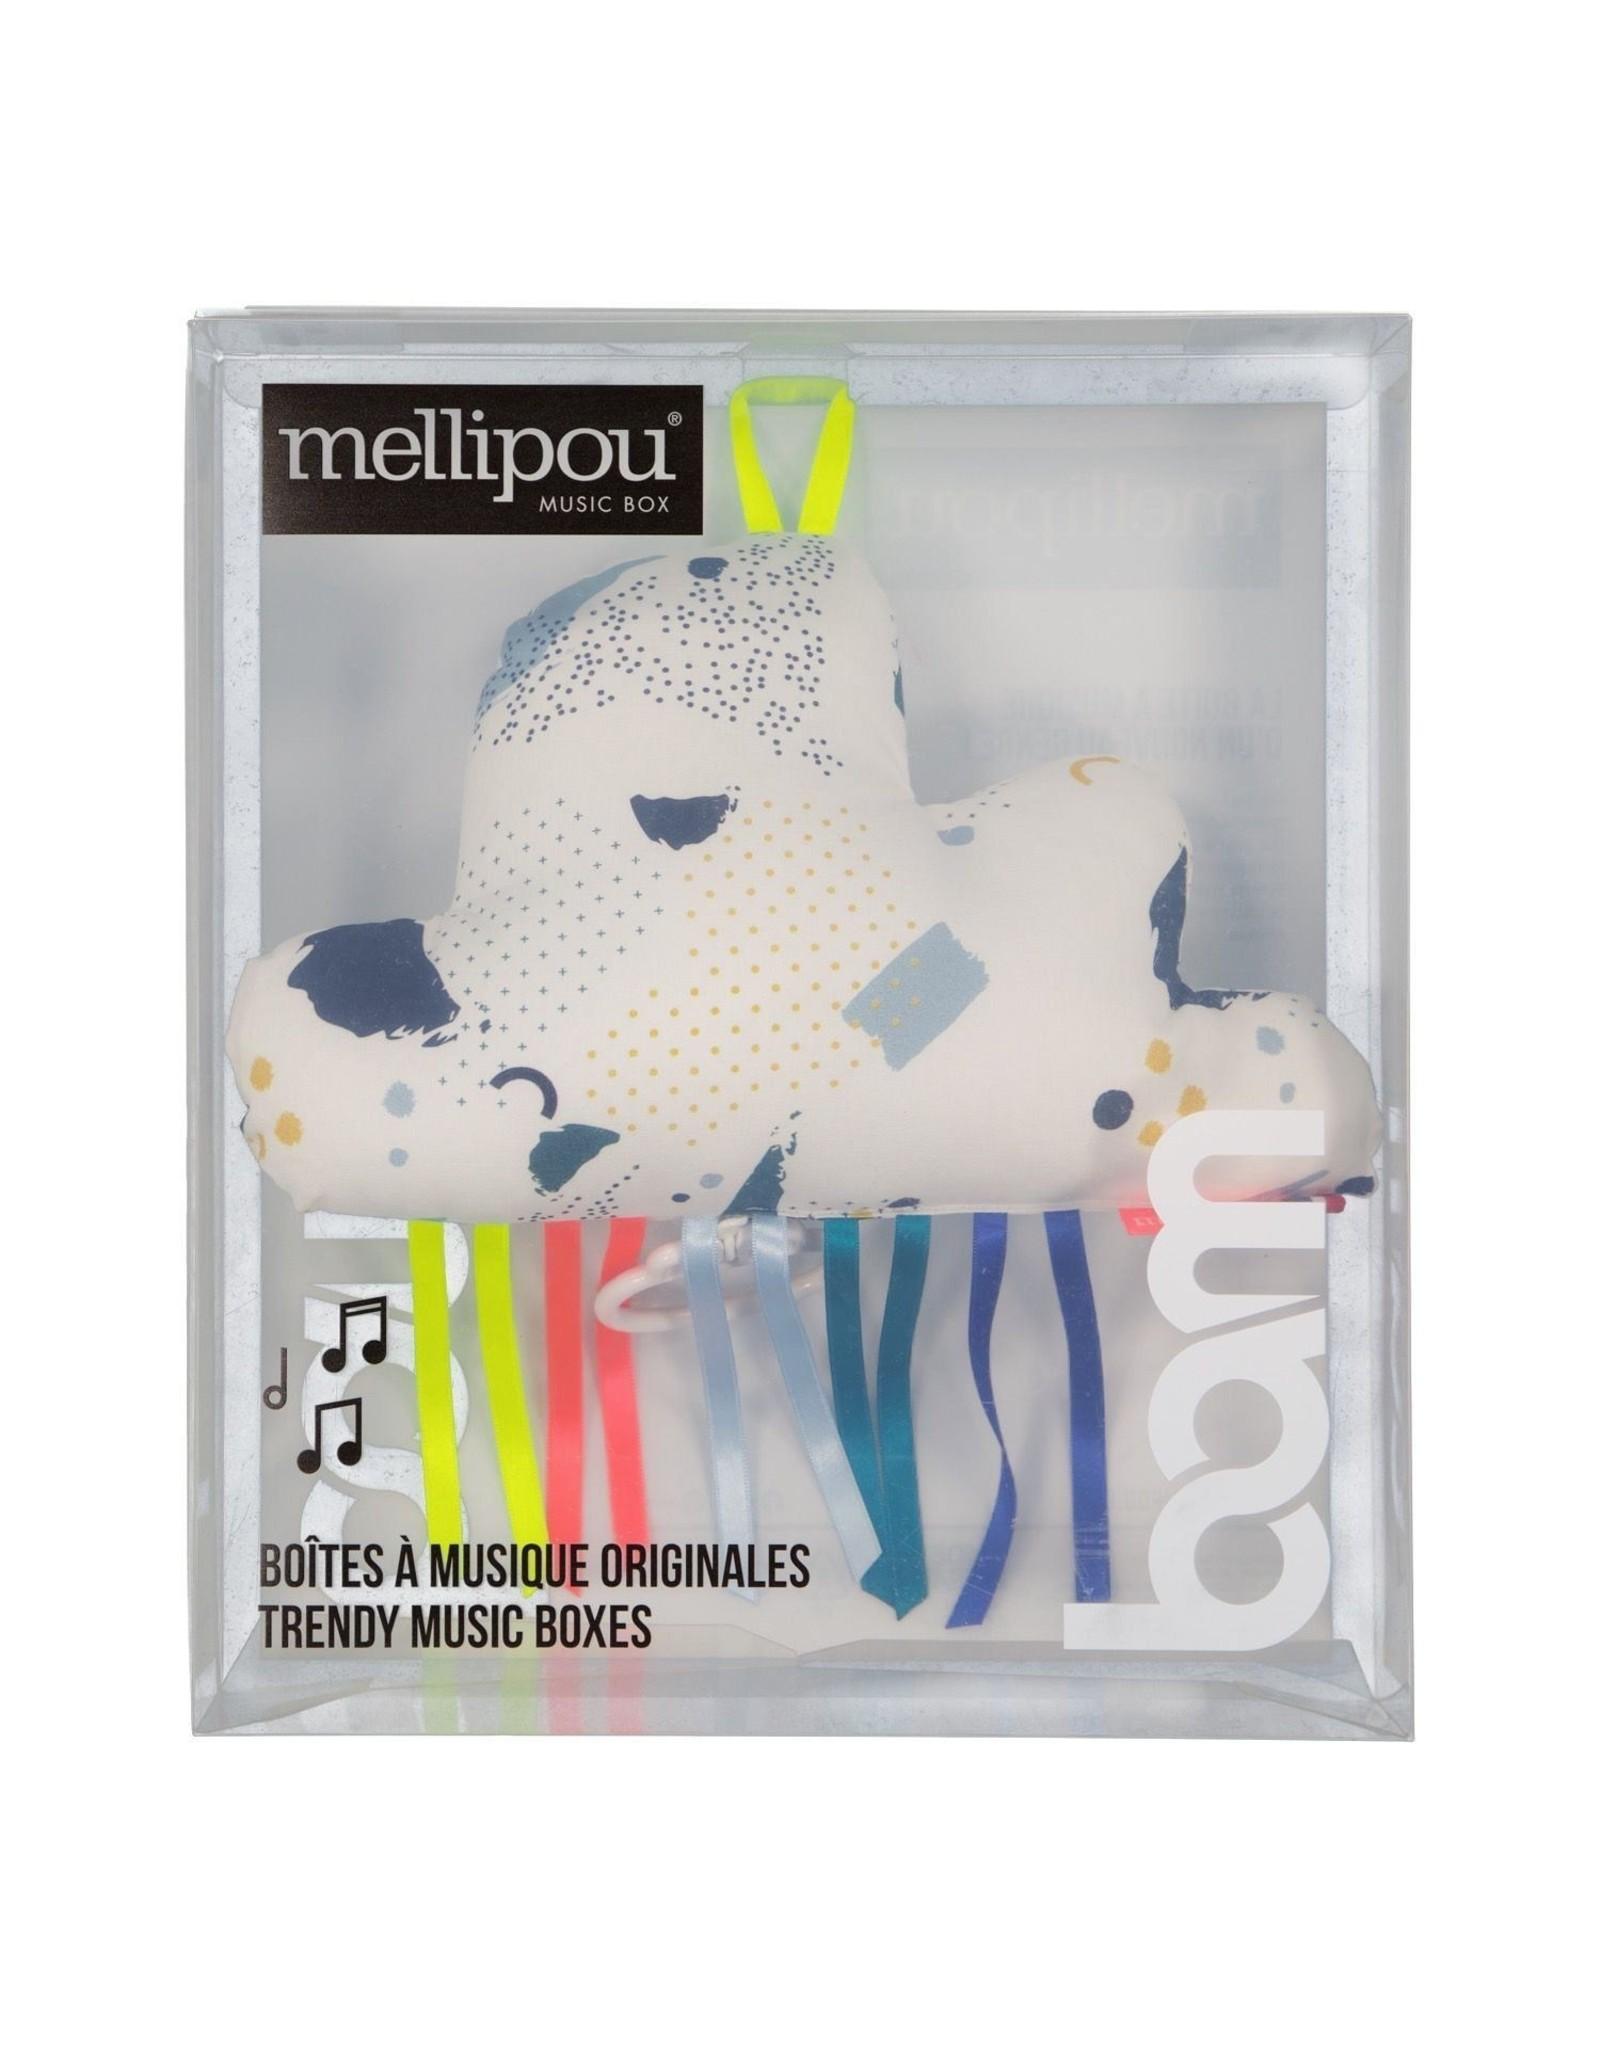 Mellipou Mellipou Music Box Nuage Freddy 'The Doors-Light my fire'